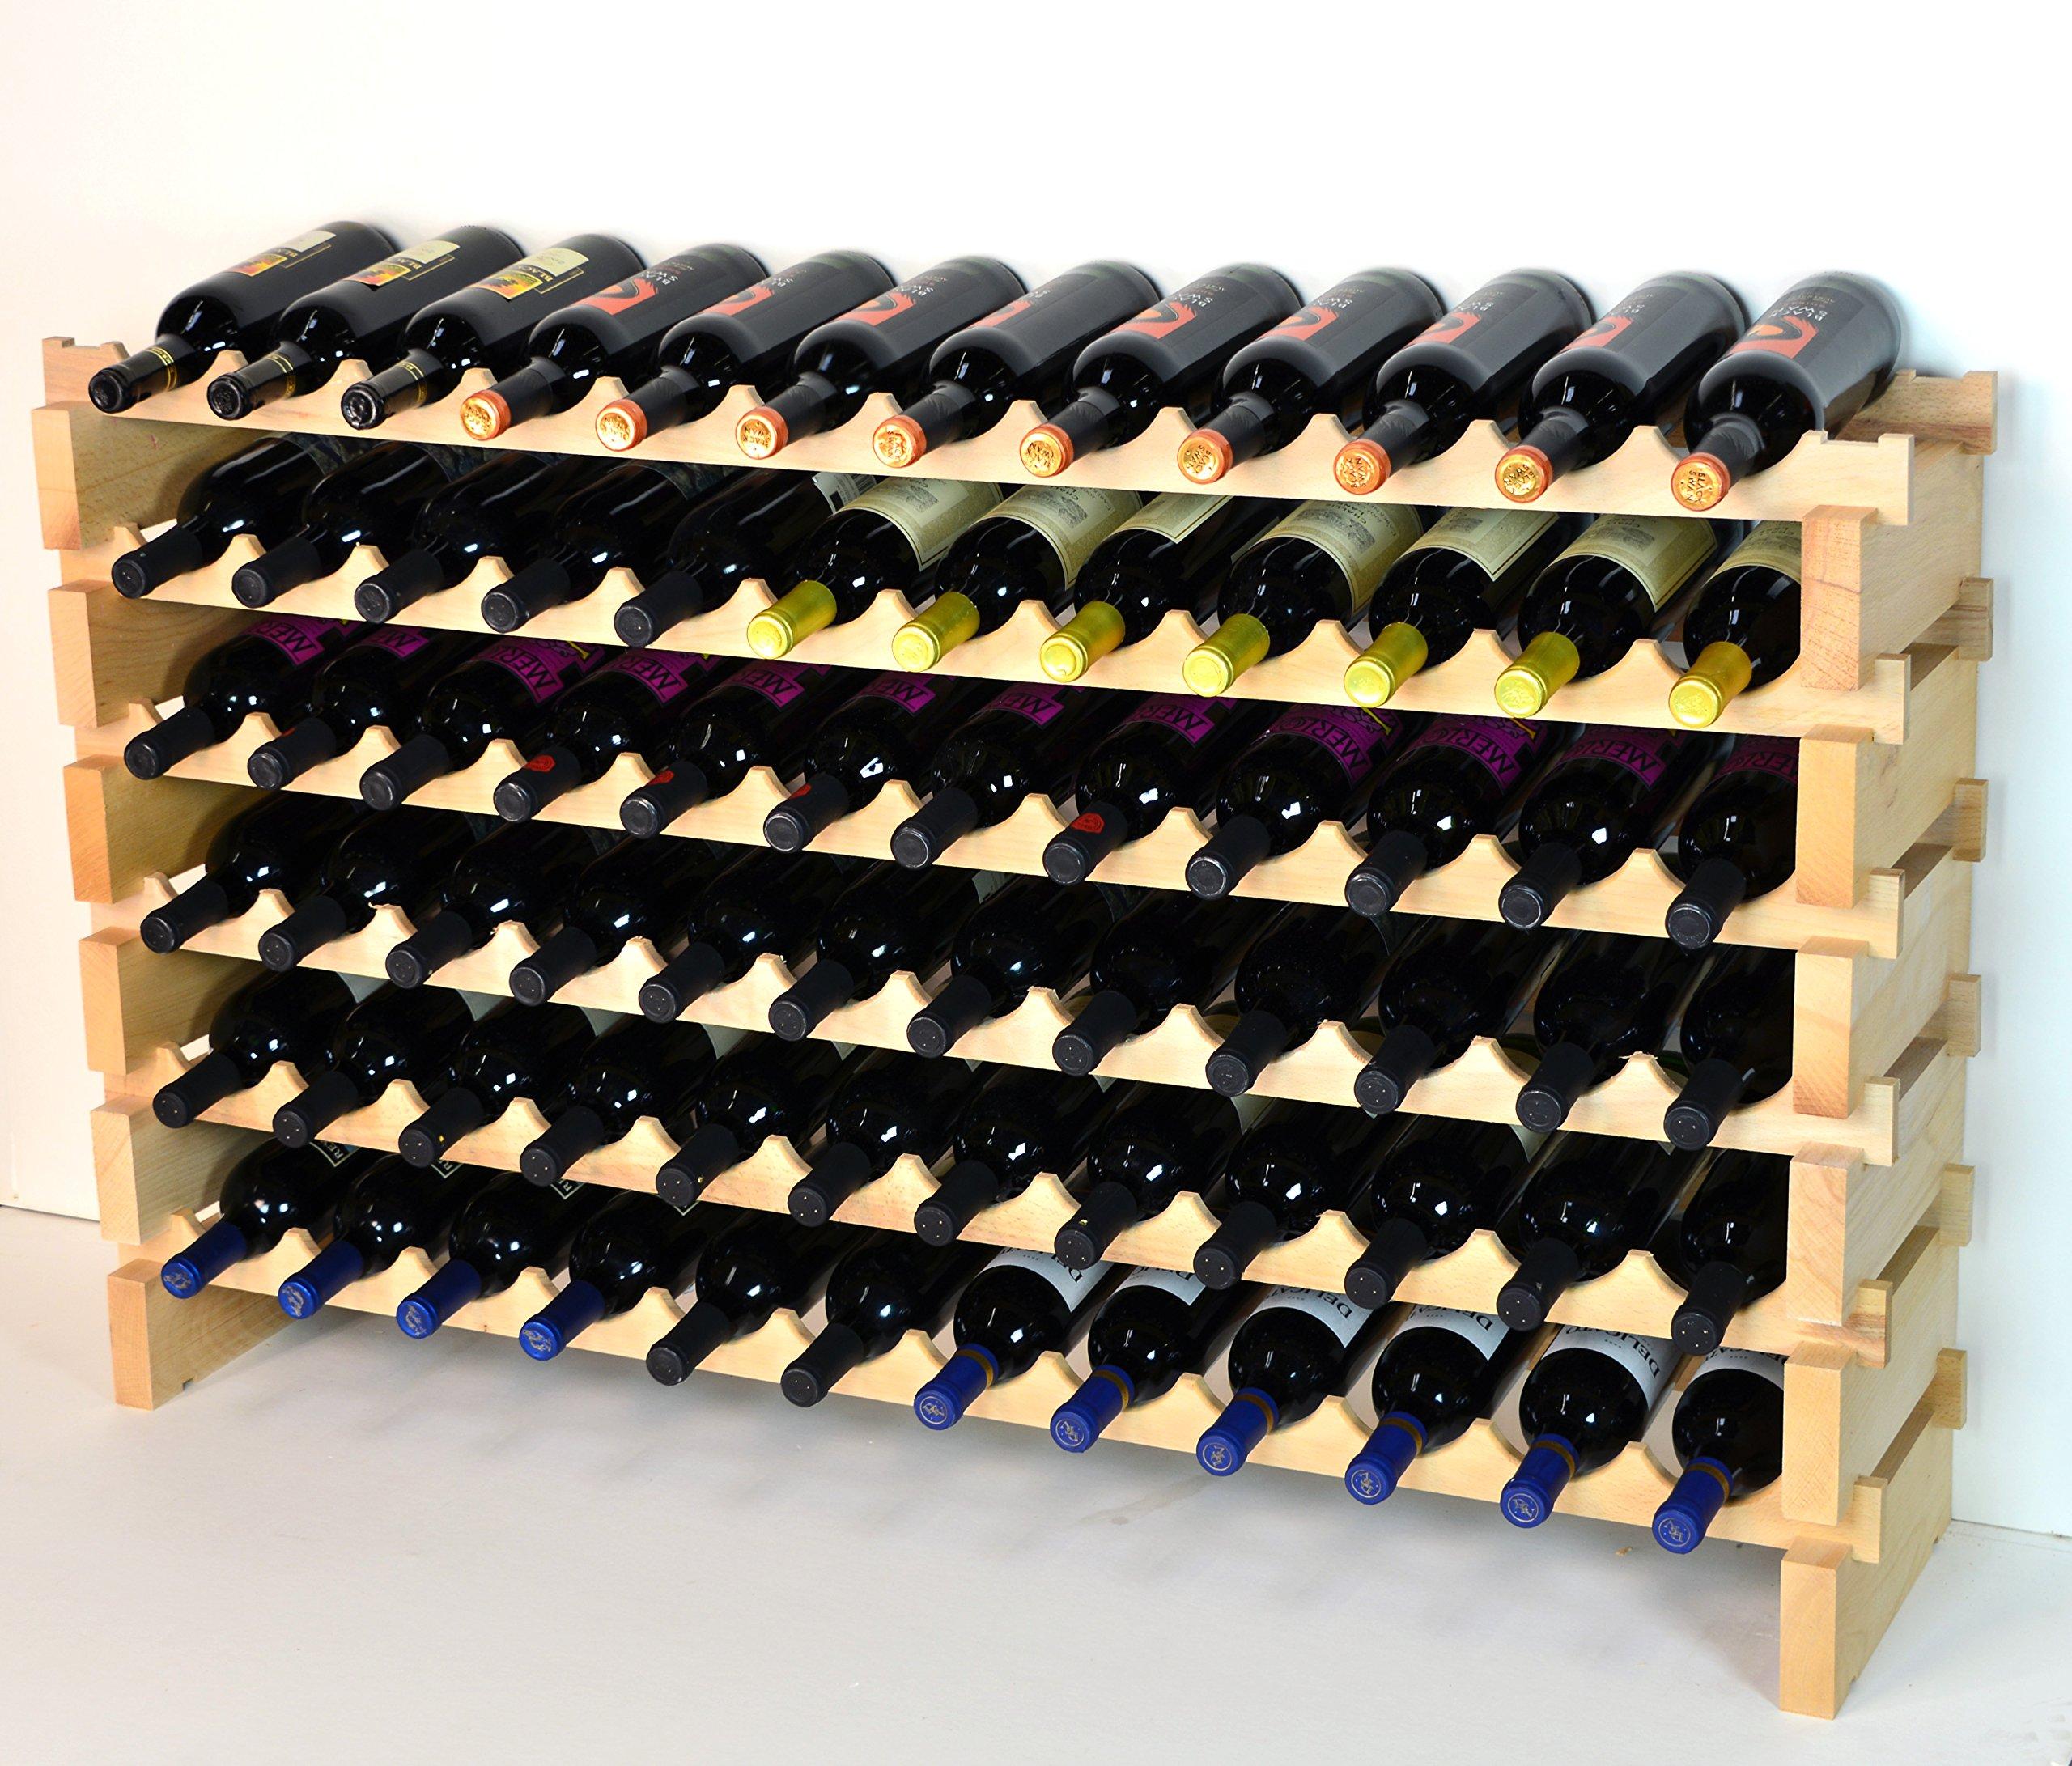 Modular Wine Rack Beachwood 48-144 Bottle Capacity 12 Bottles Across up to 12 Rows Newest Improved Model (72 Bottles - 6 Rows)